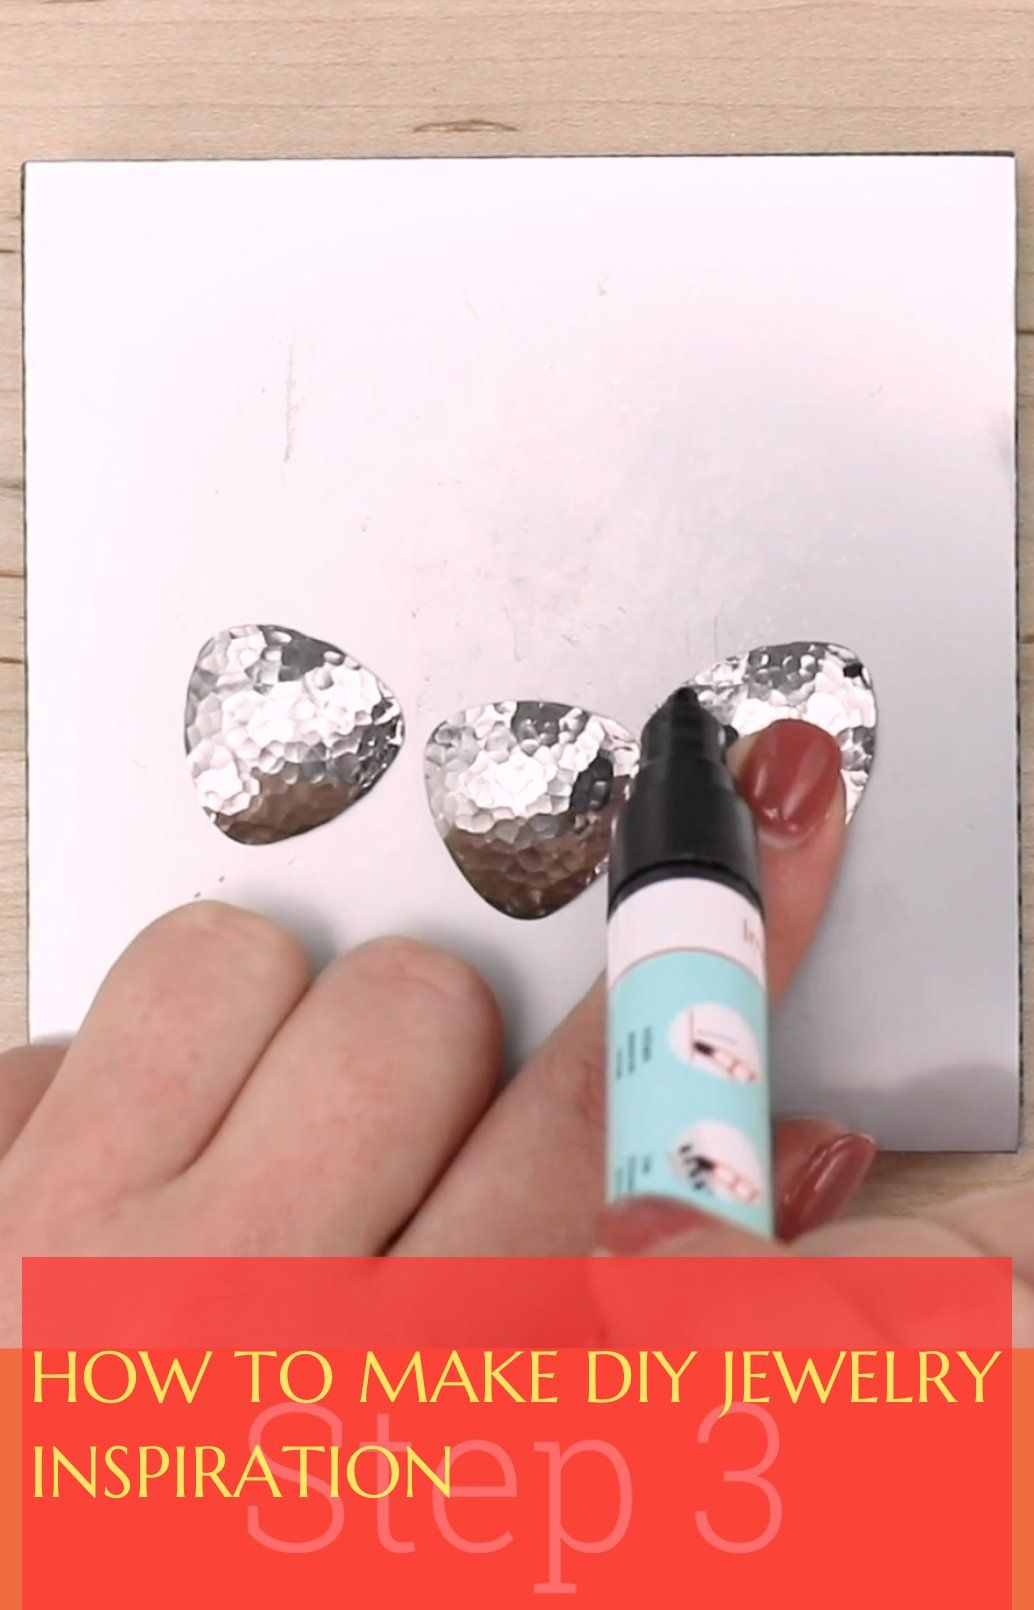 How To Make diy jewelry inspiration